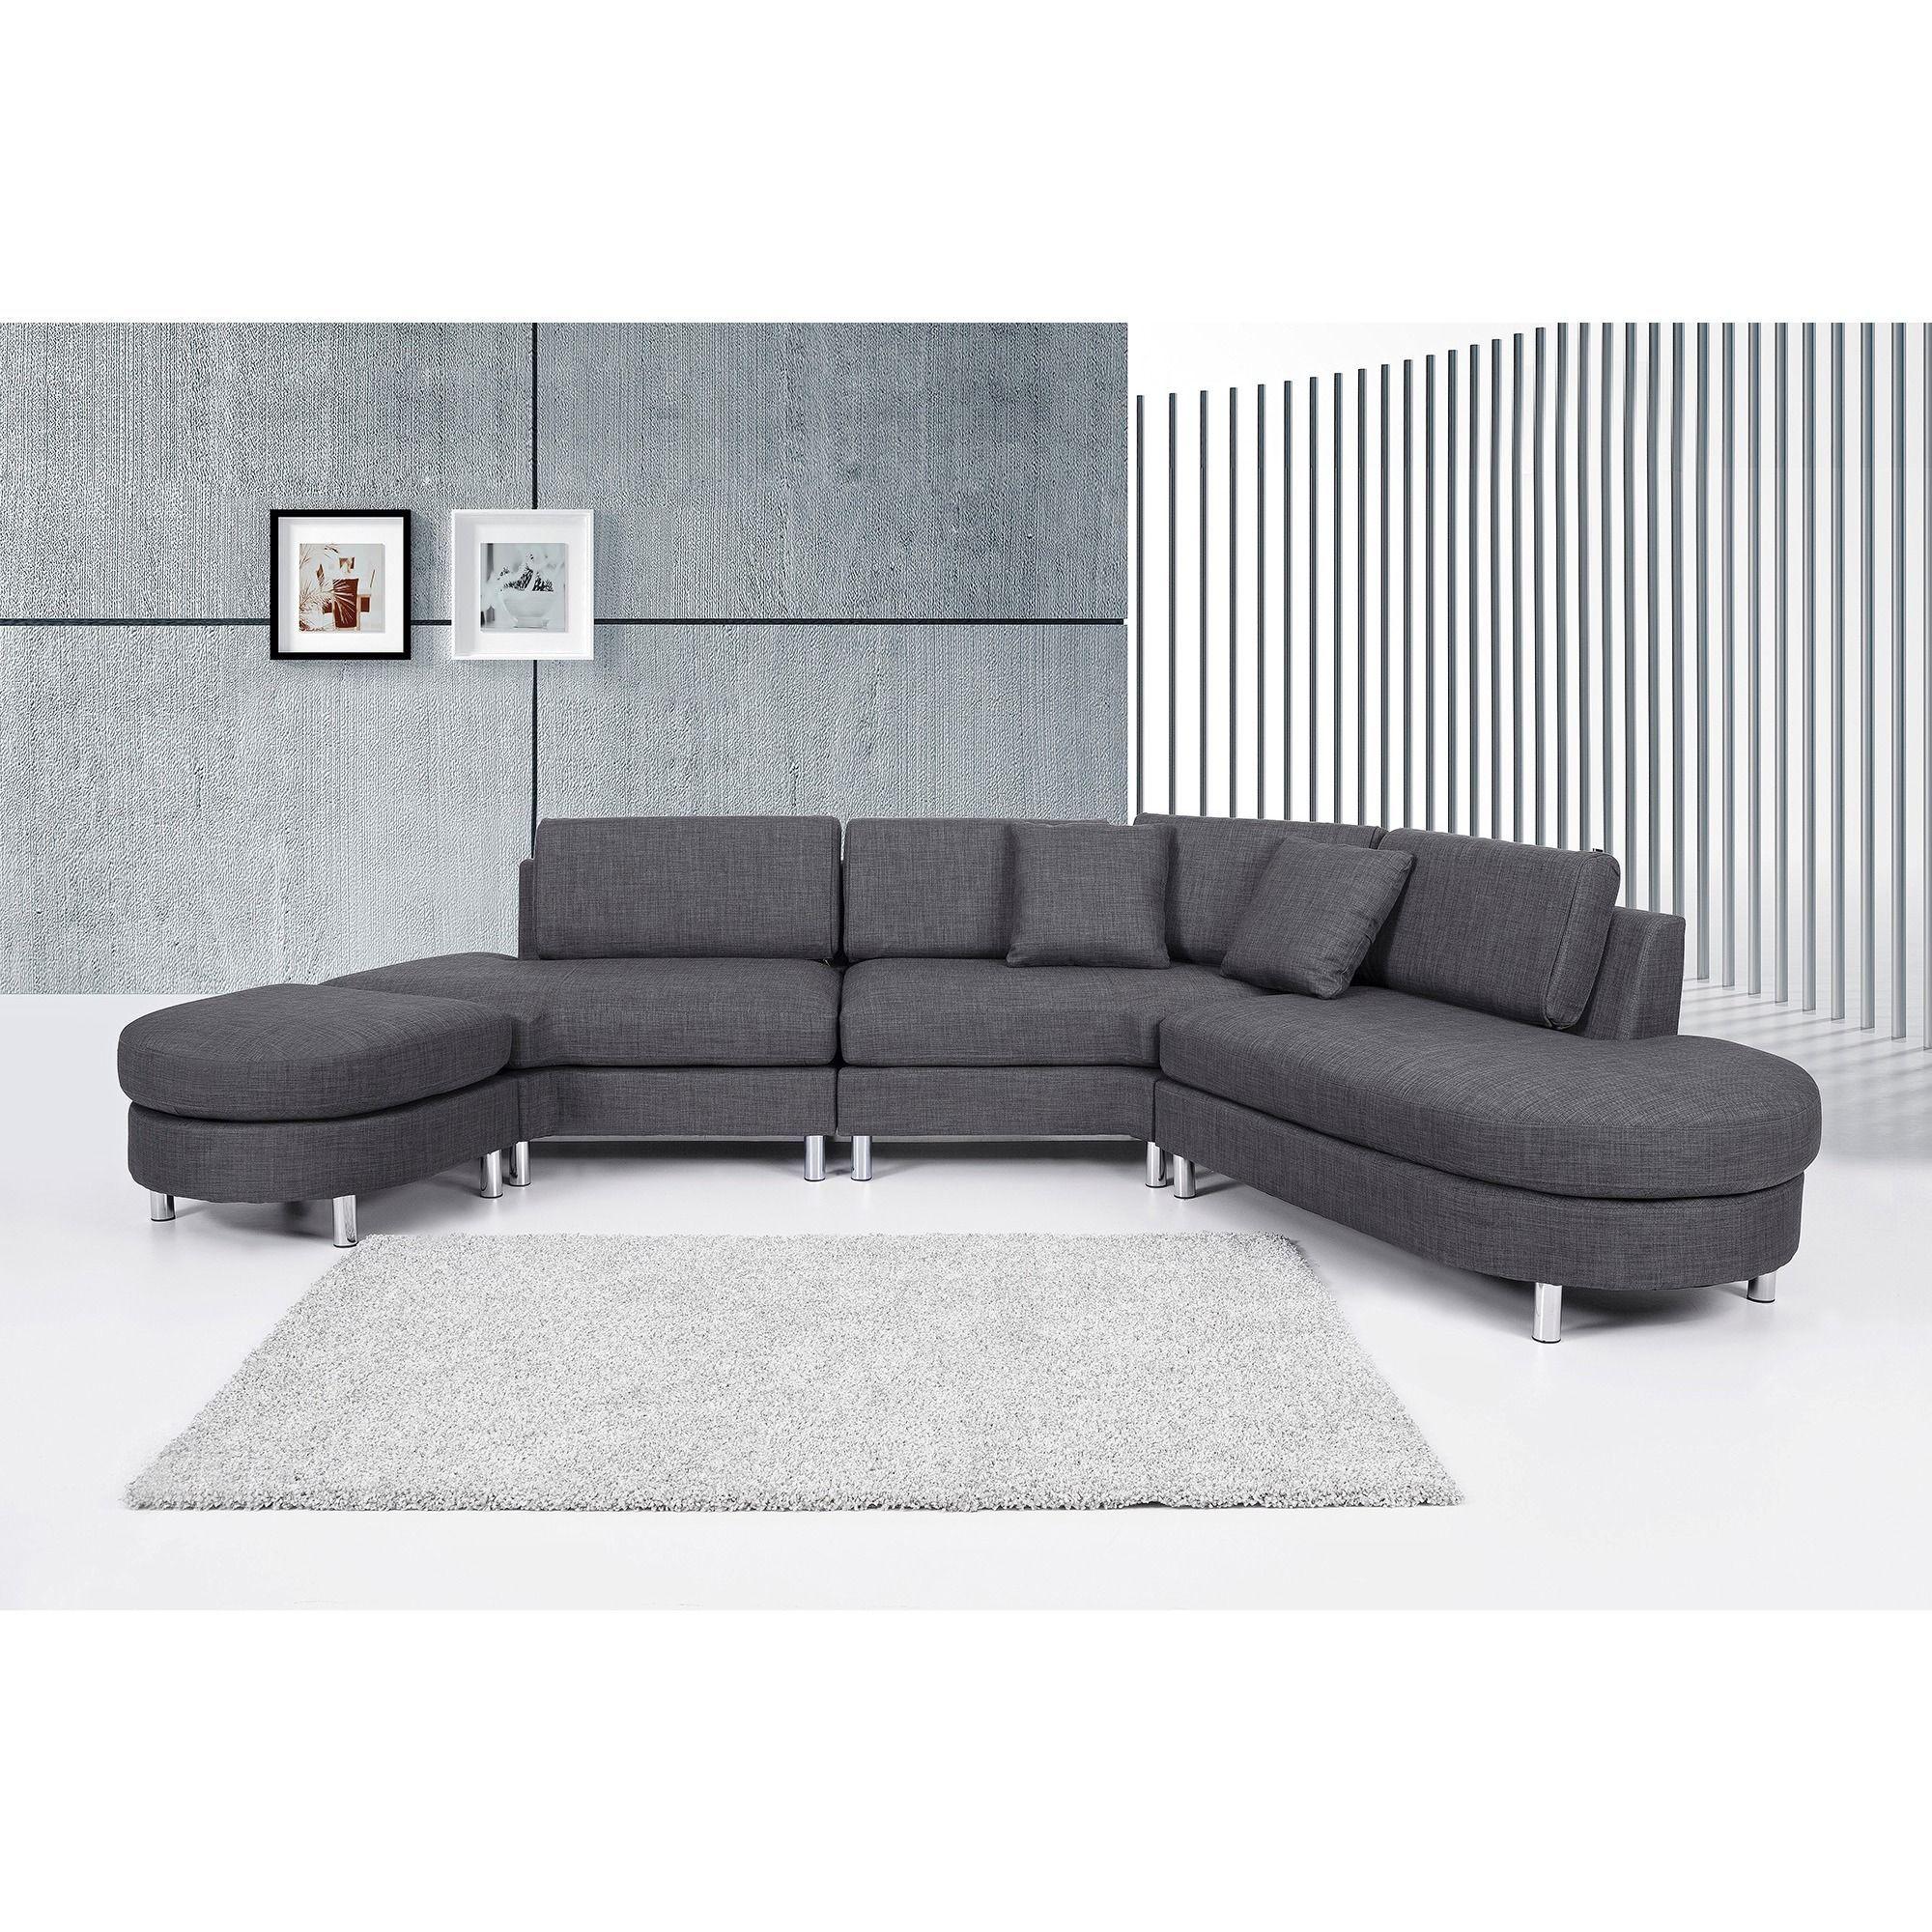 Beliani Copenhagen Contemporary Italian Design Sectional ...